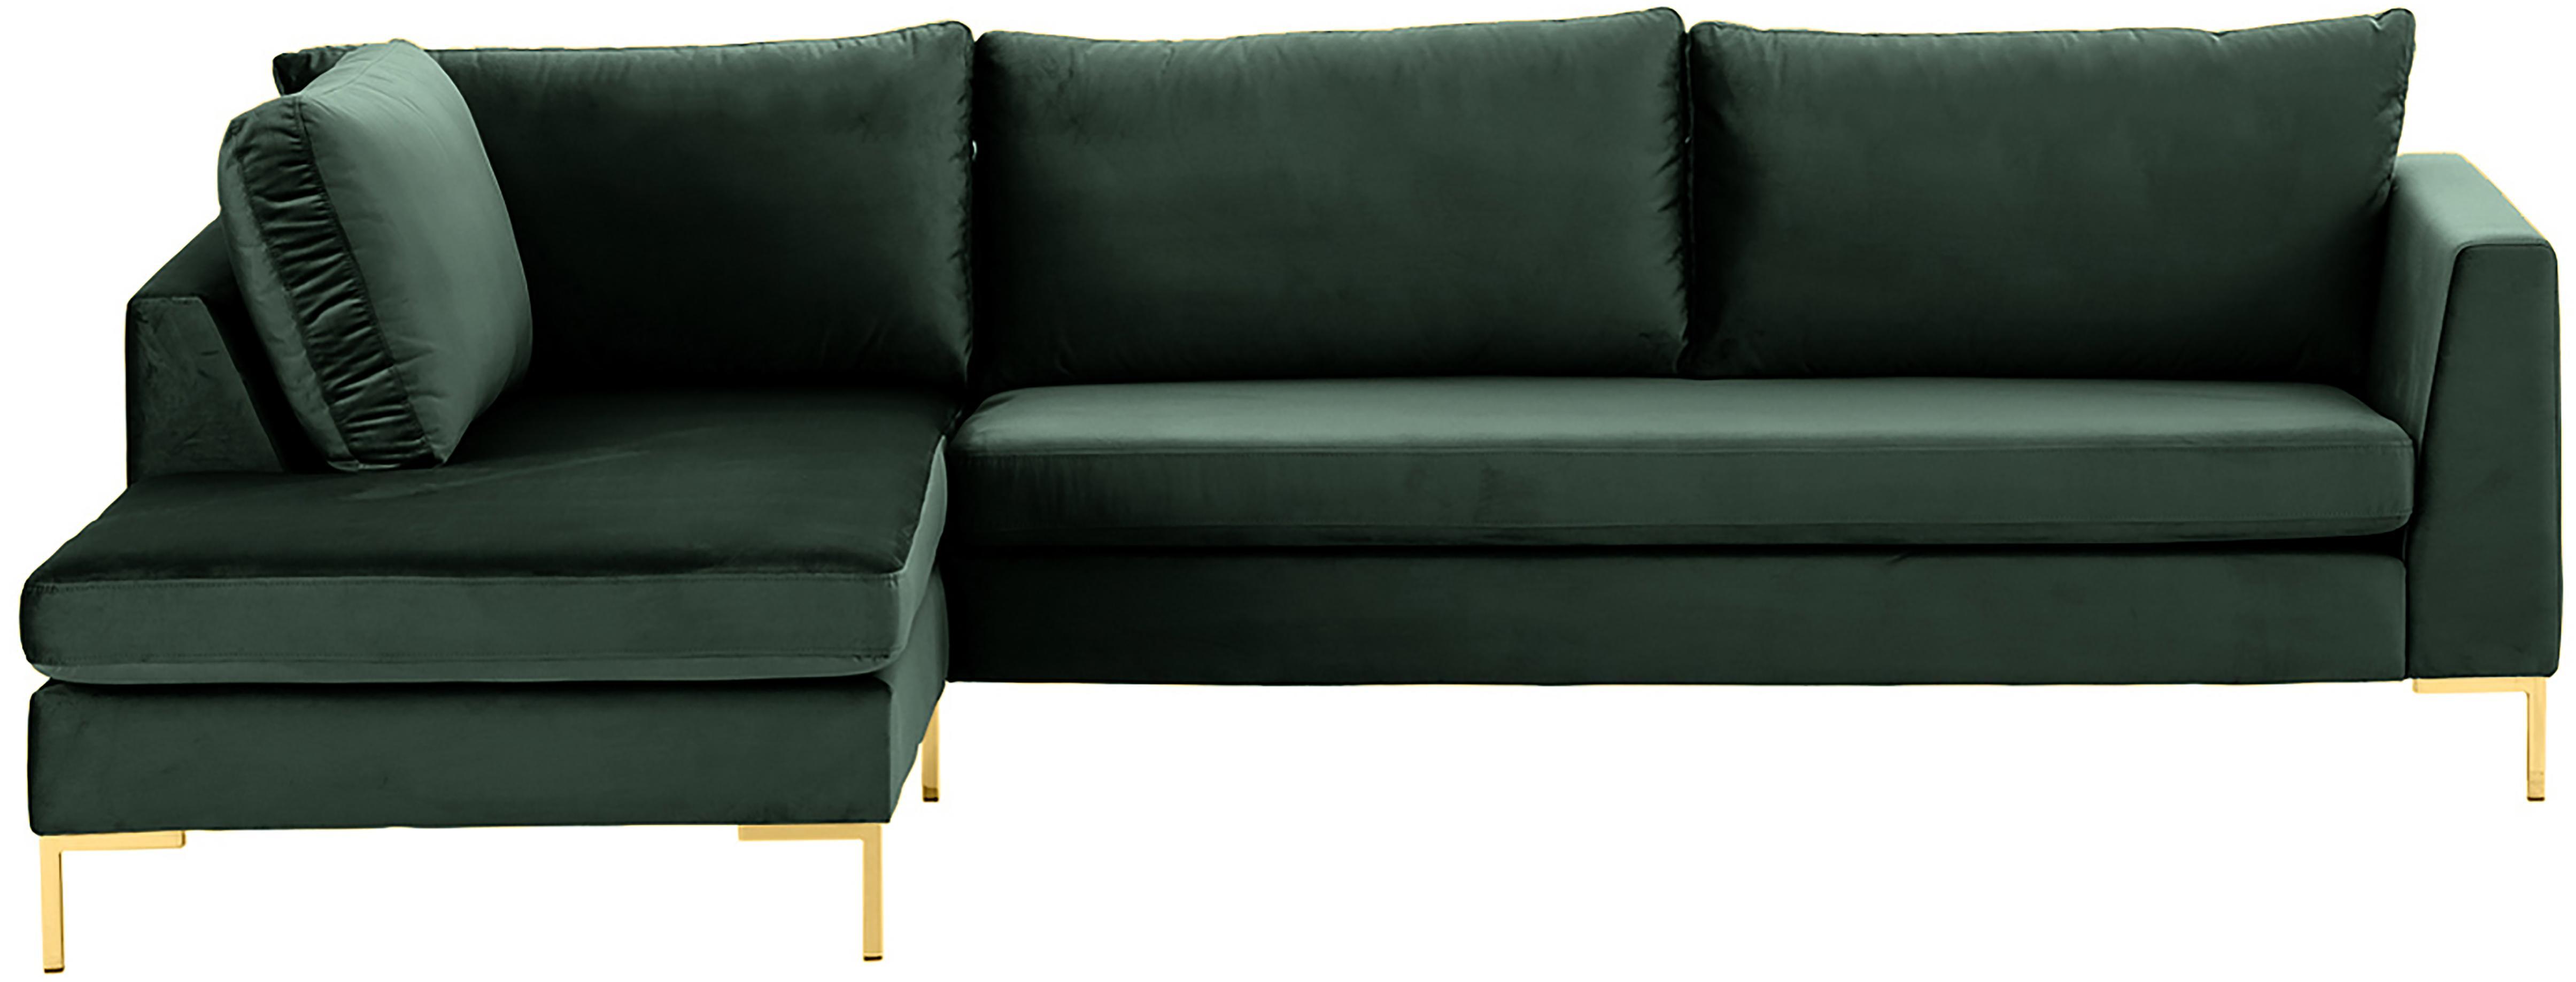 Samt-Ecksofa Luna, Bezug: Samt (Polyester) Der hoch, Gestell: Massives Buchenholz, Füße: Metall, galvanisiert, Samt Dunkelgrün, Gold, B 280 x T 184 cm